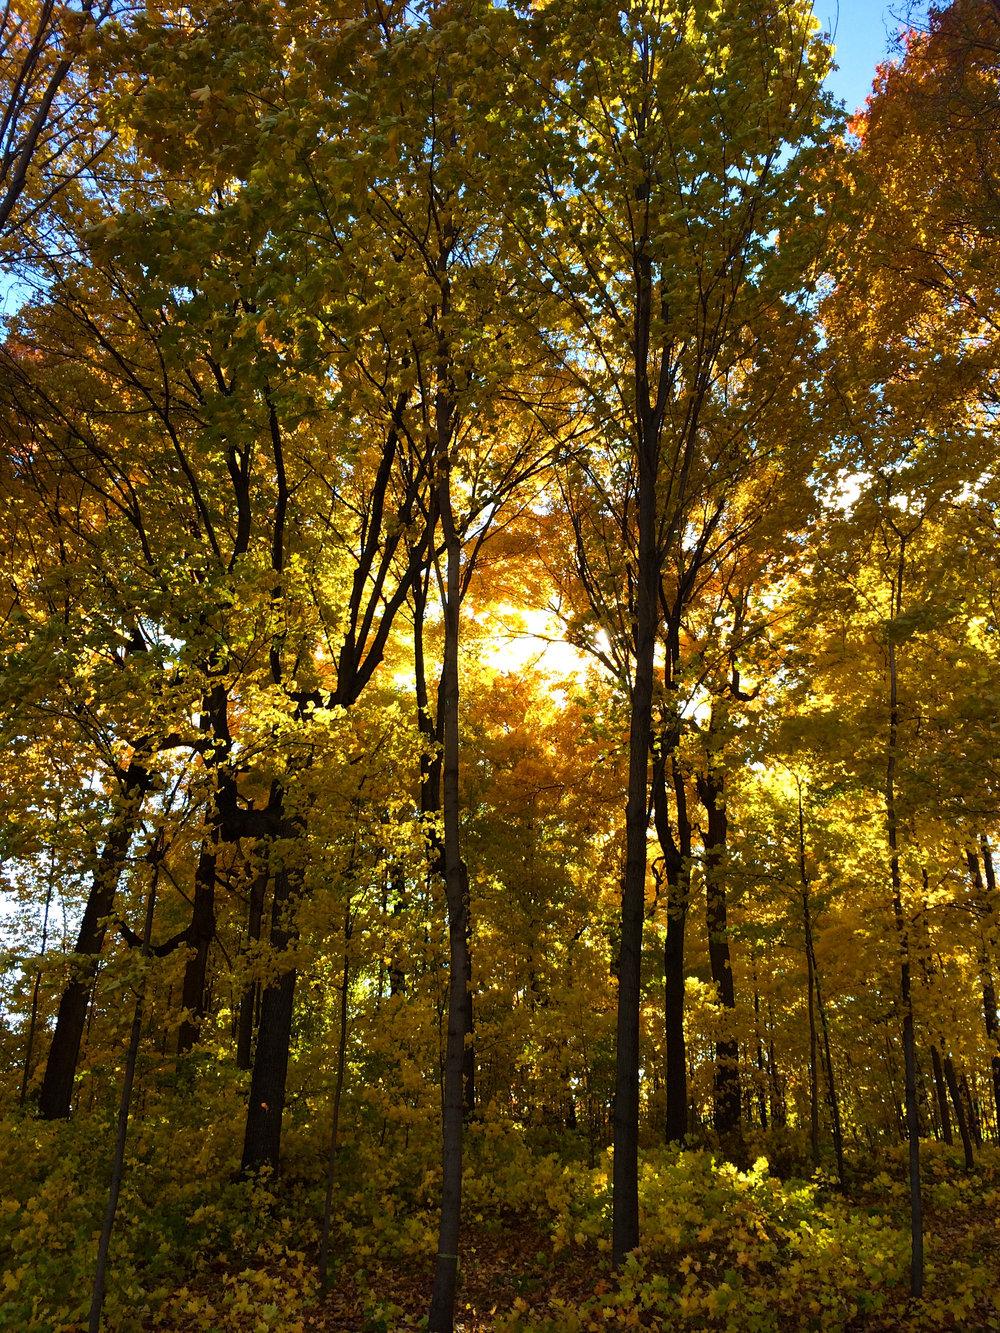 cindi_fall_forest_spiritedtable_photo1.jpg